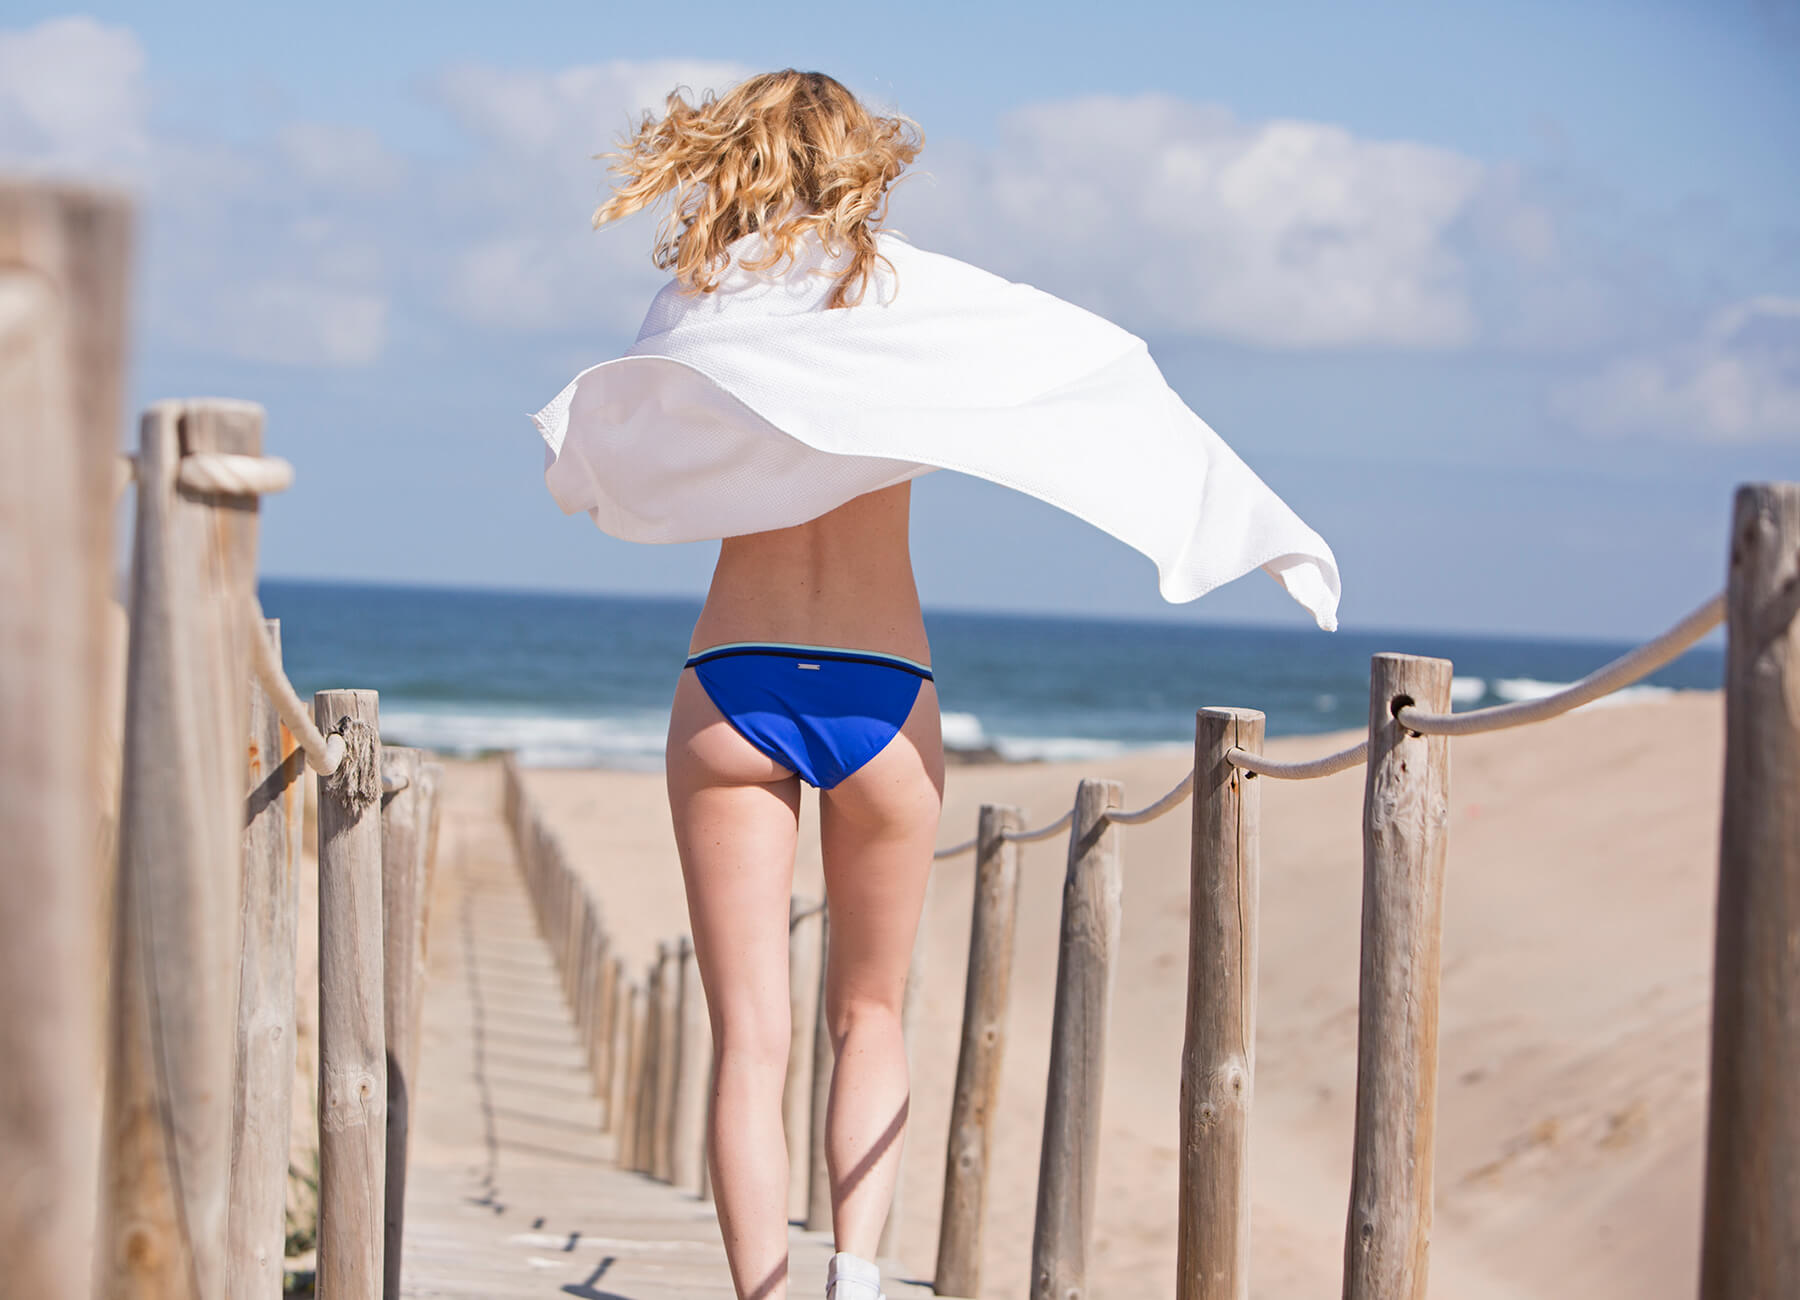 Lissabon_Beach_Walking_Sunny